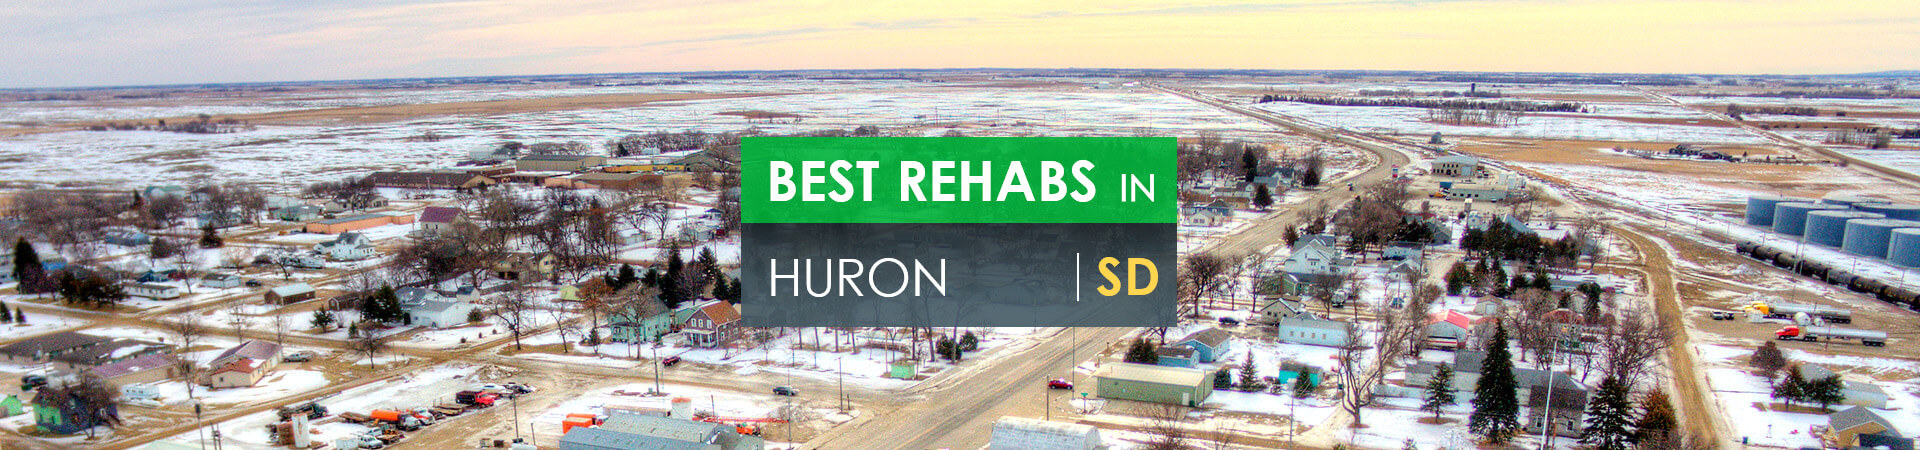 Best rehabs in Huron, SD